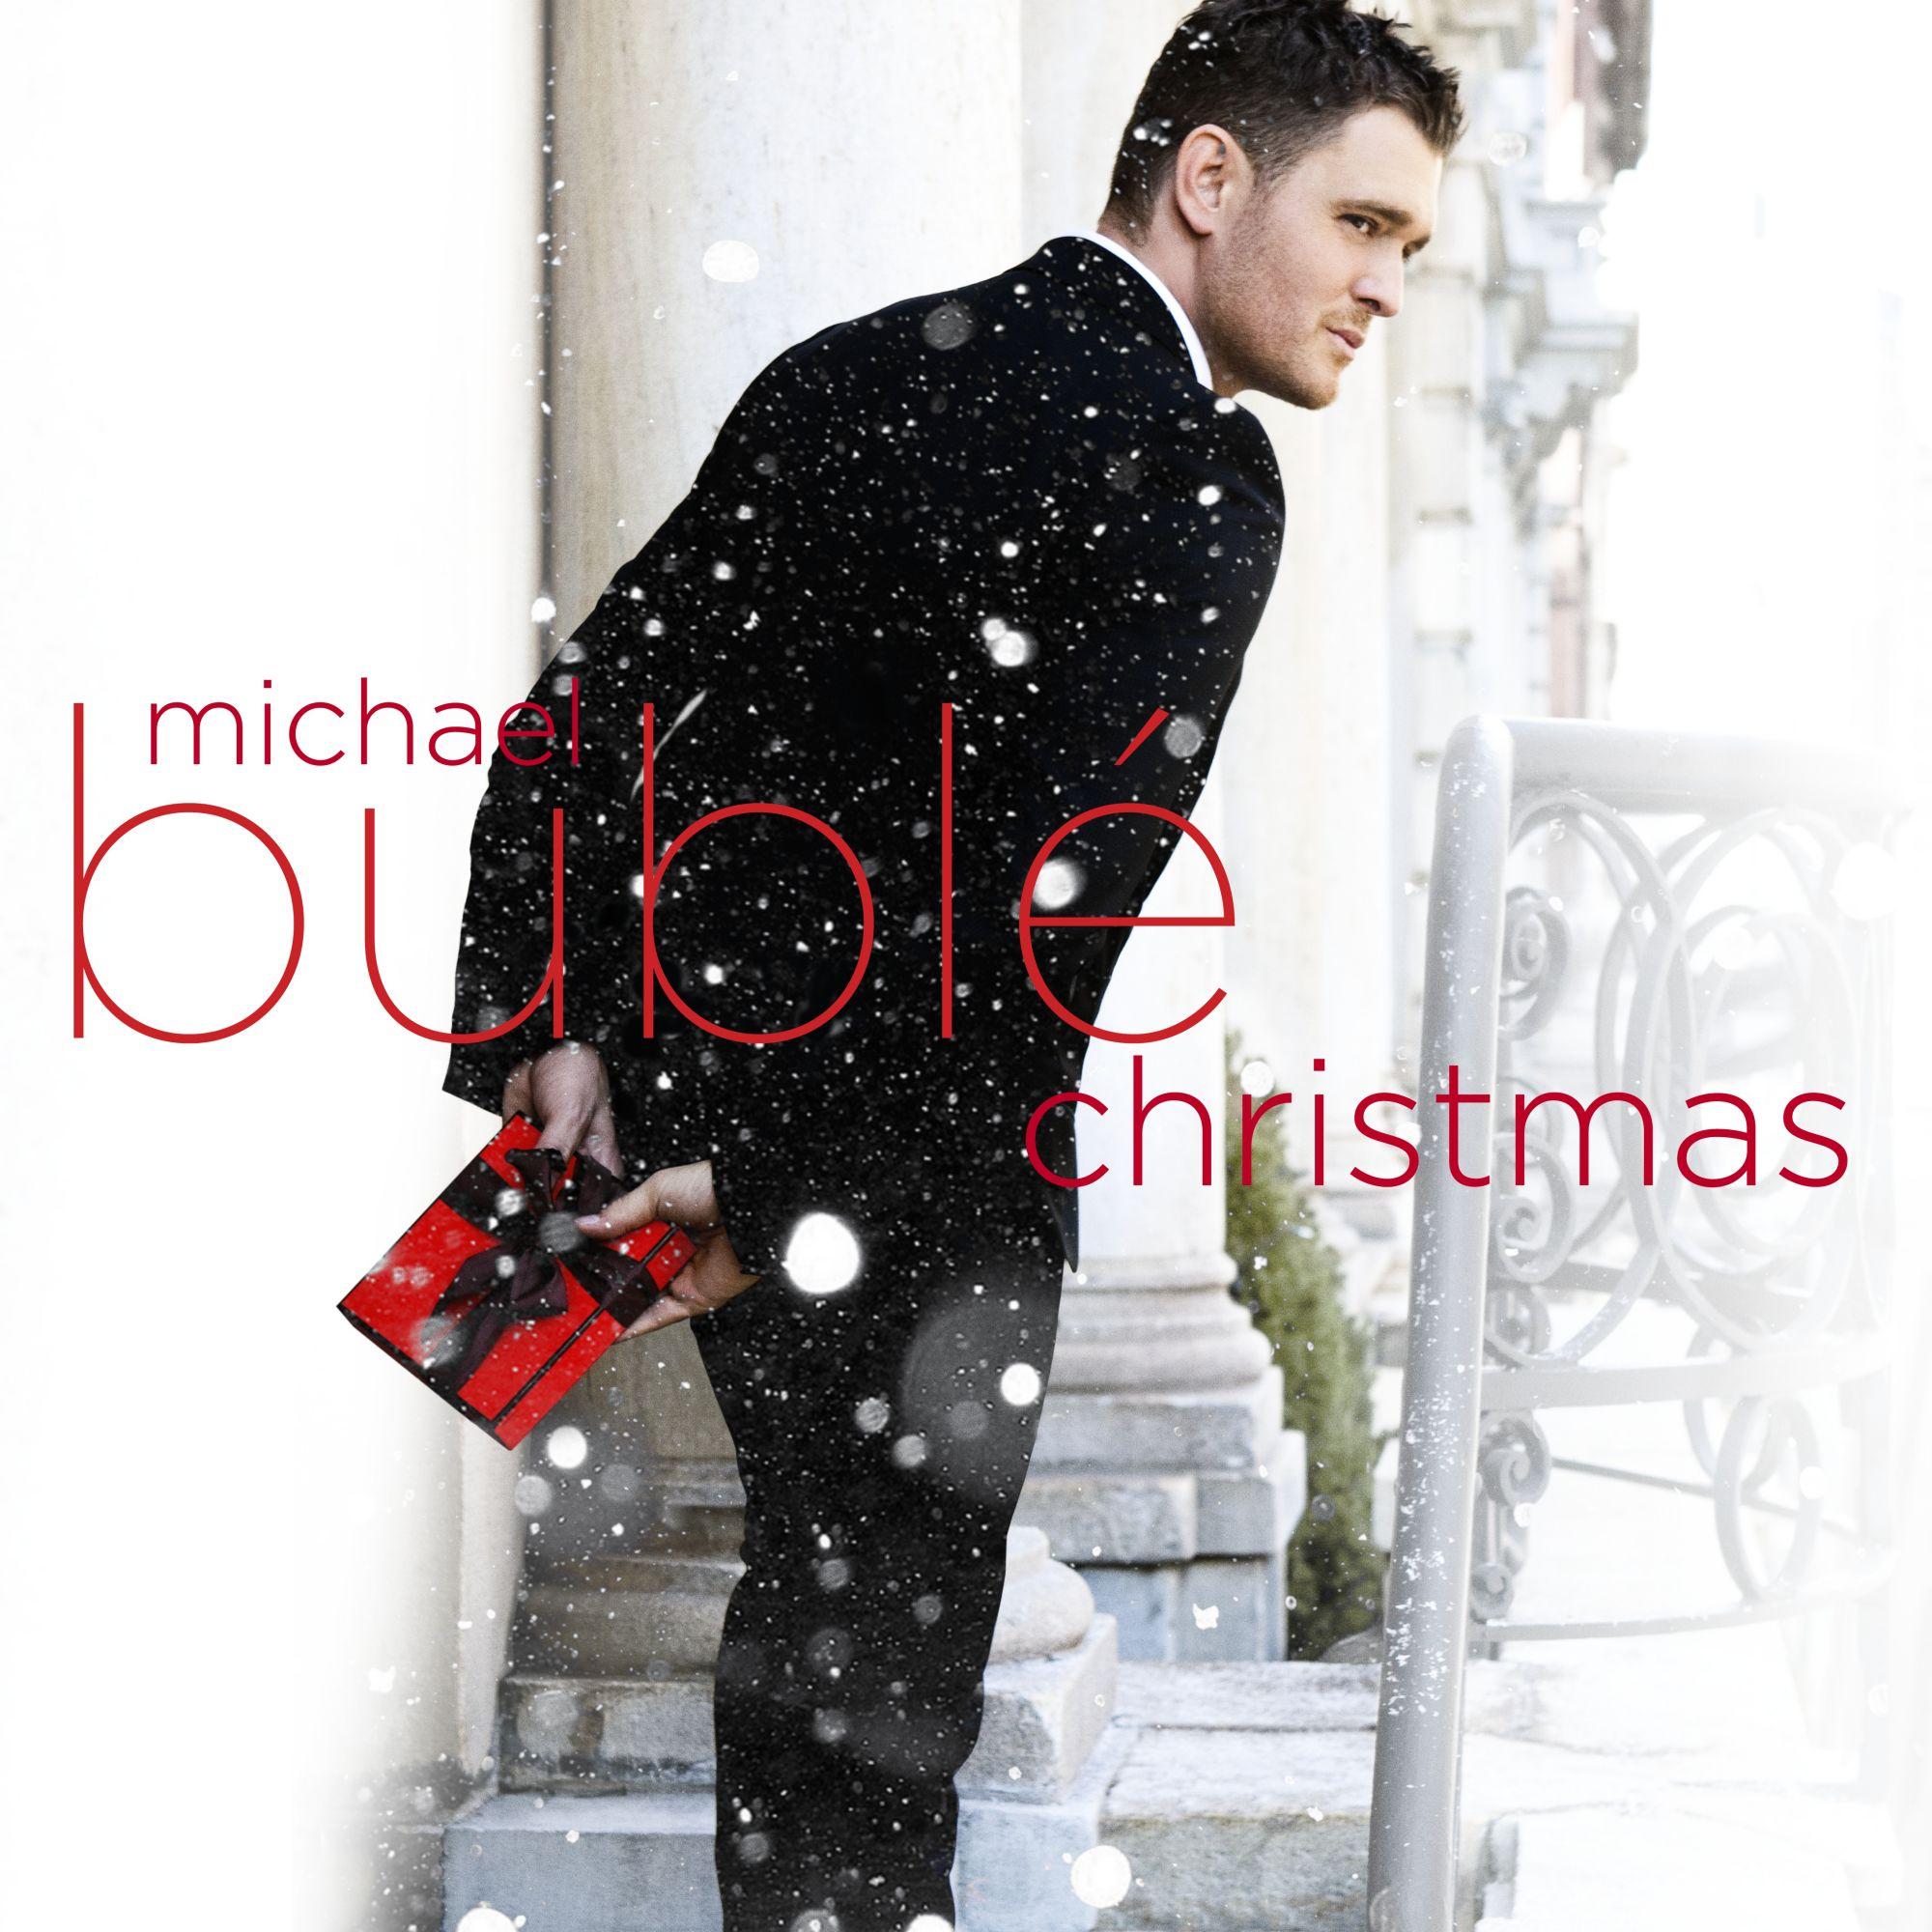 https://i2.wp.com/www.media.wmg-is.com/media/portal/media/cms/images/201108/christmas--cover-art-extralarge_1313541716823.jpg